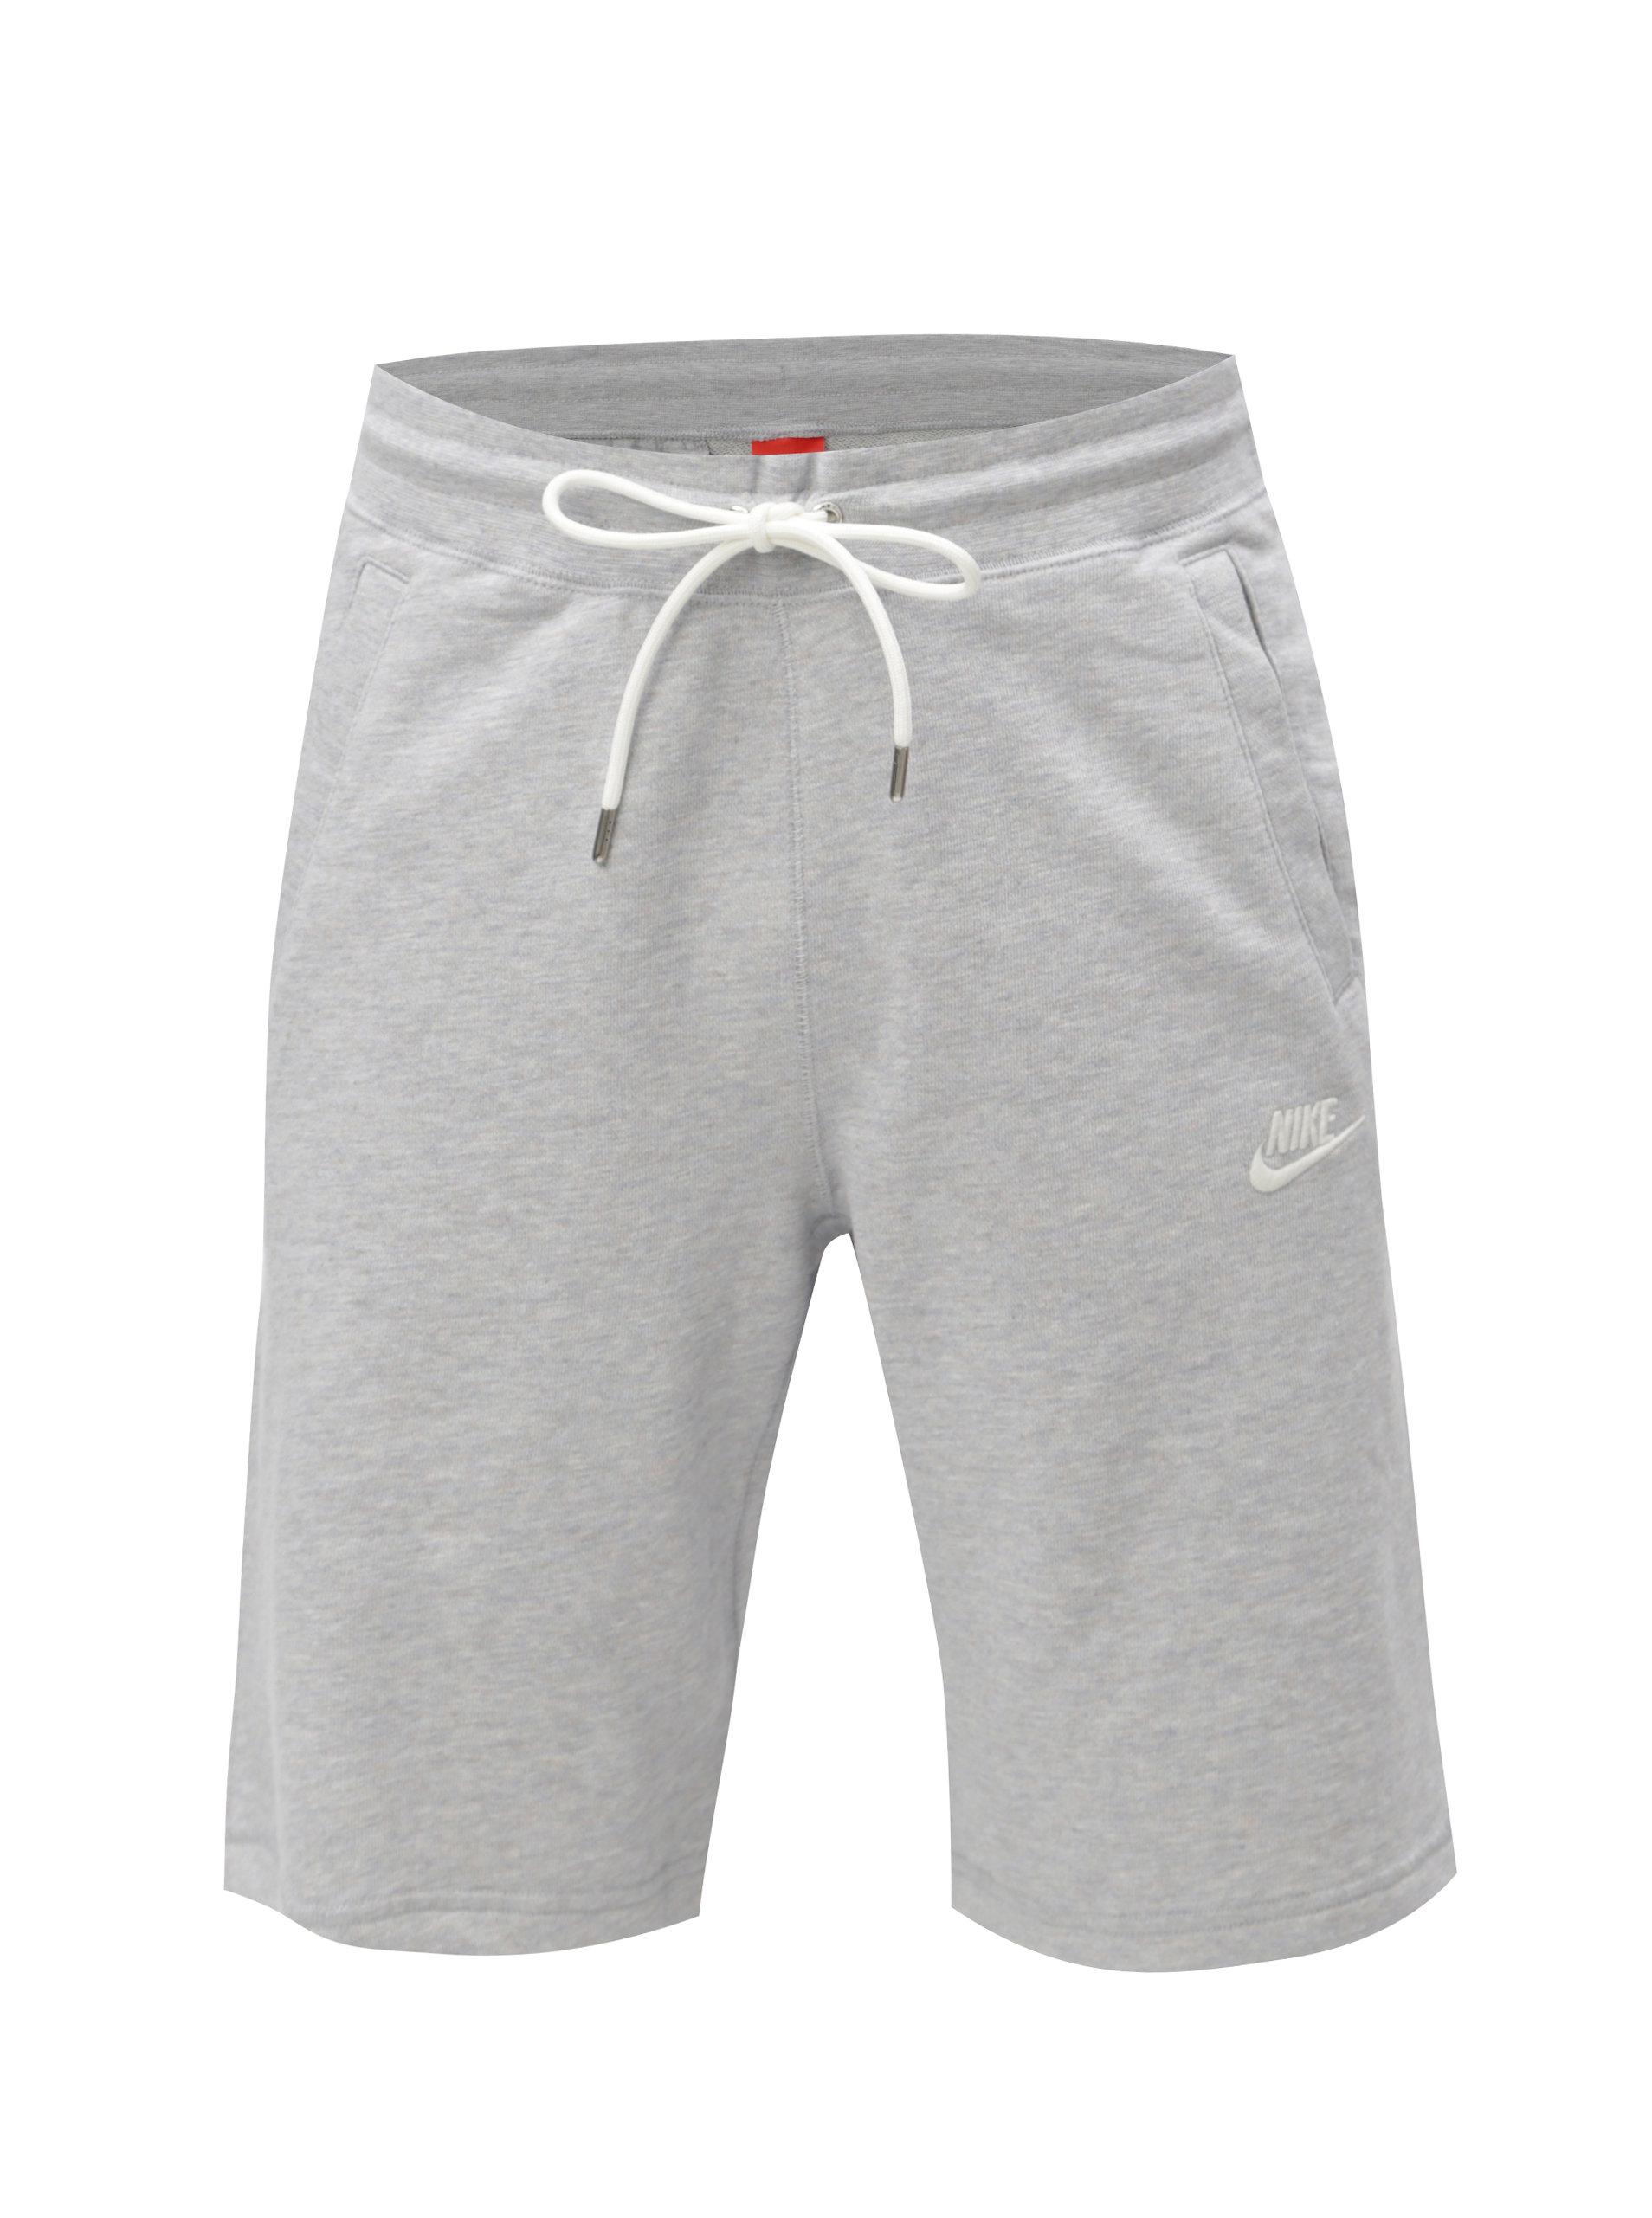 966b390df4e Světle šedé pánské žíhané teplákové kraťasy Nike ...